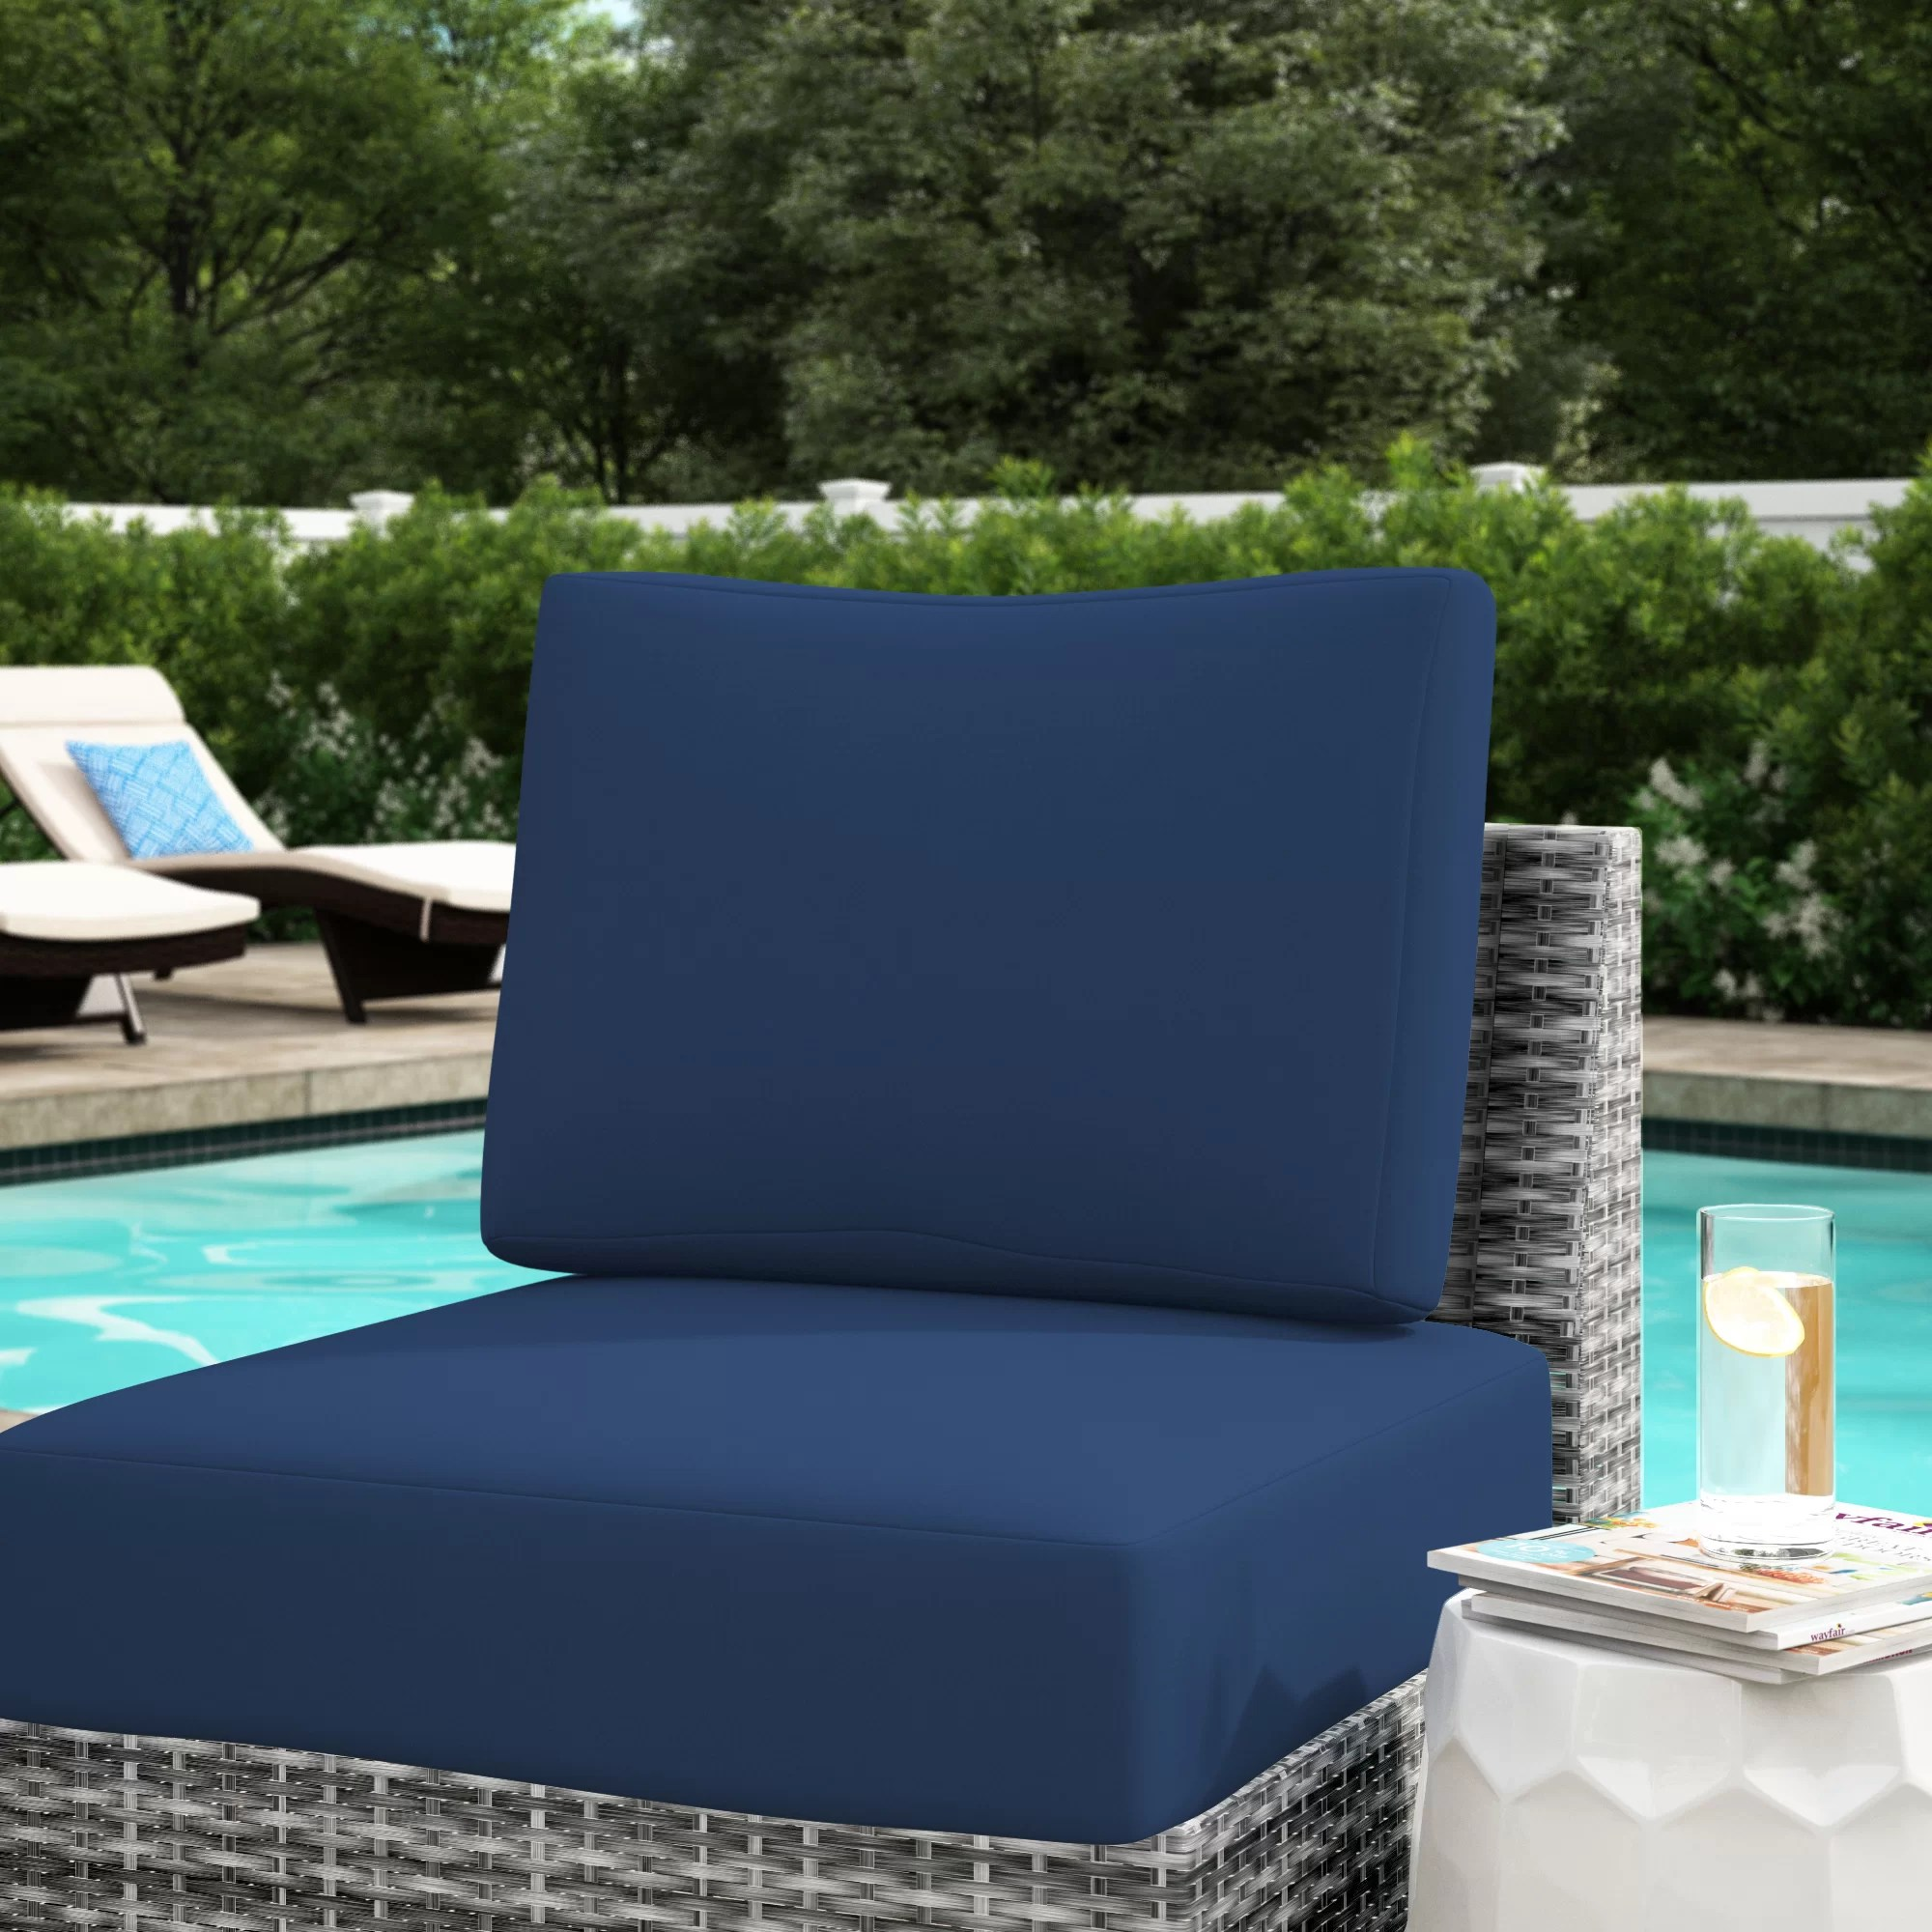 rochford outdoor cushion cover set